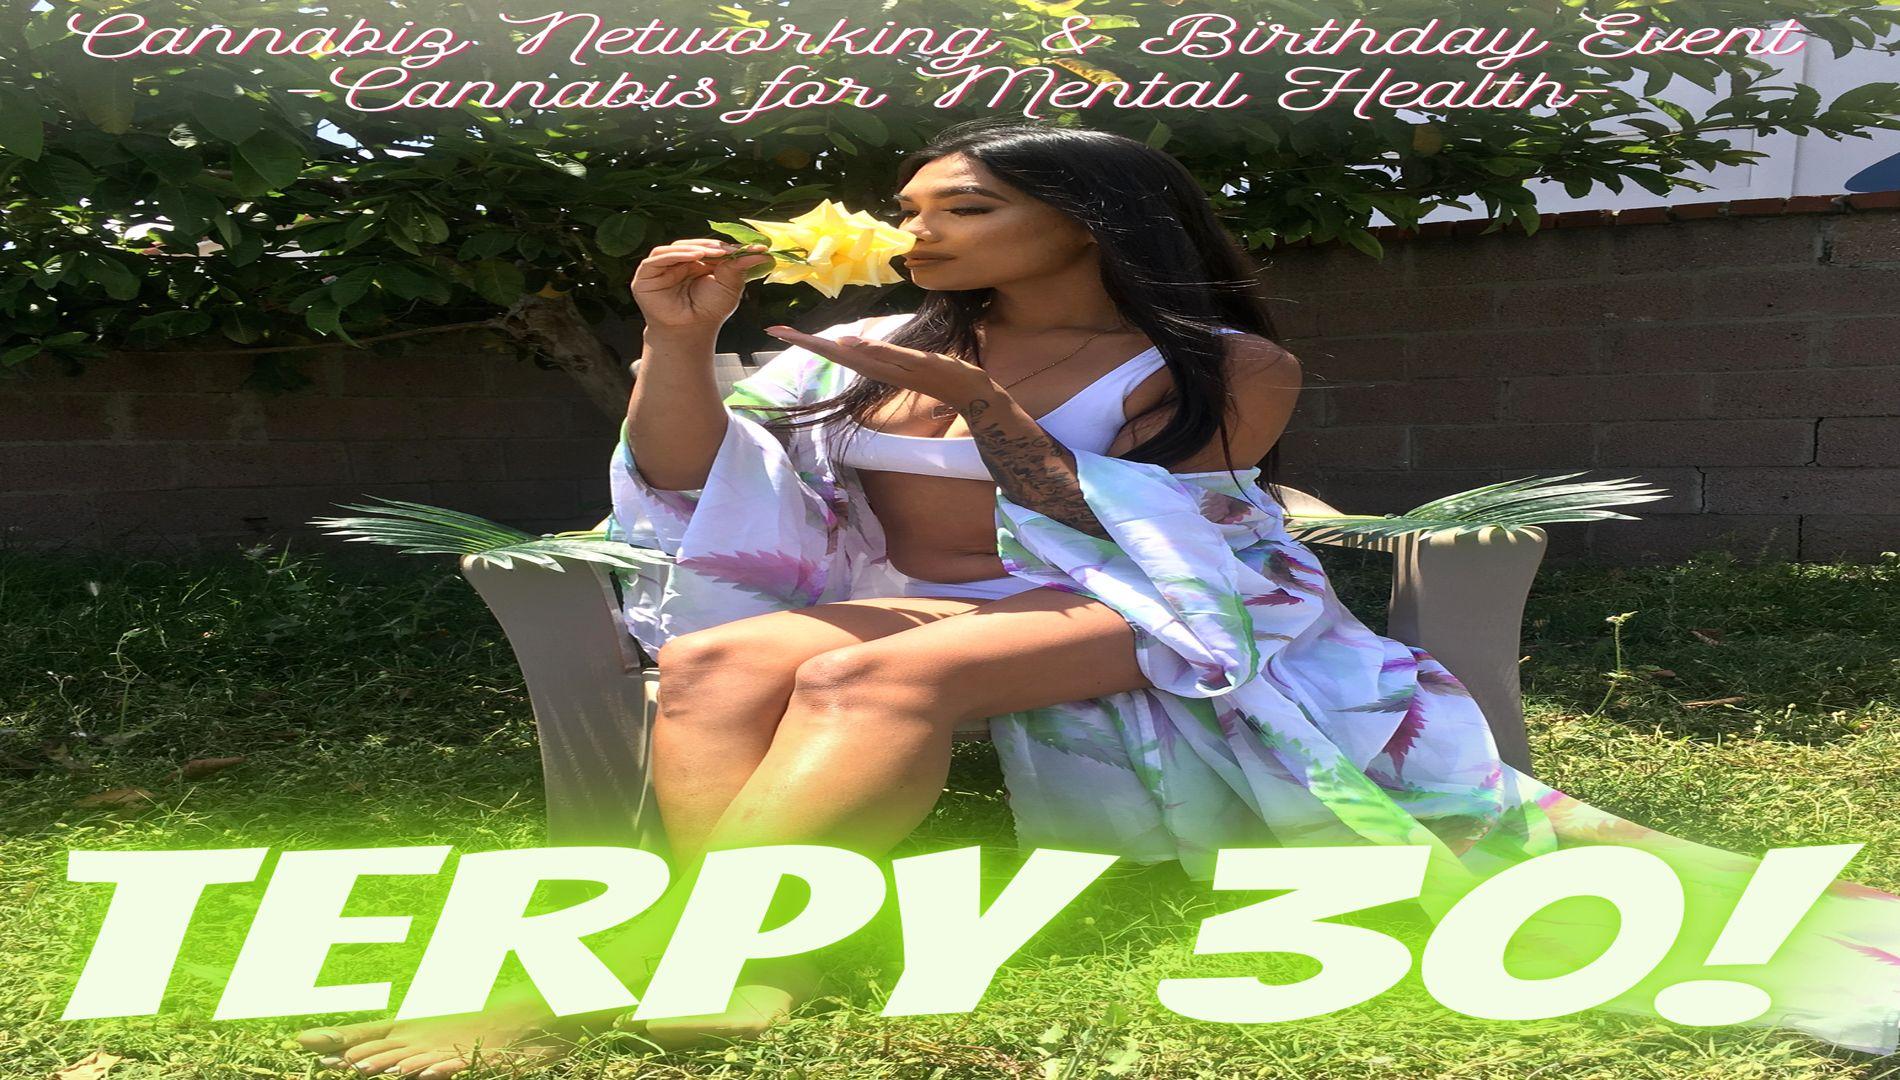 TERPY 30 BIRTHDAY NETWORKING CANNABIZ EVENT